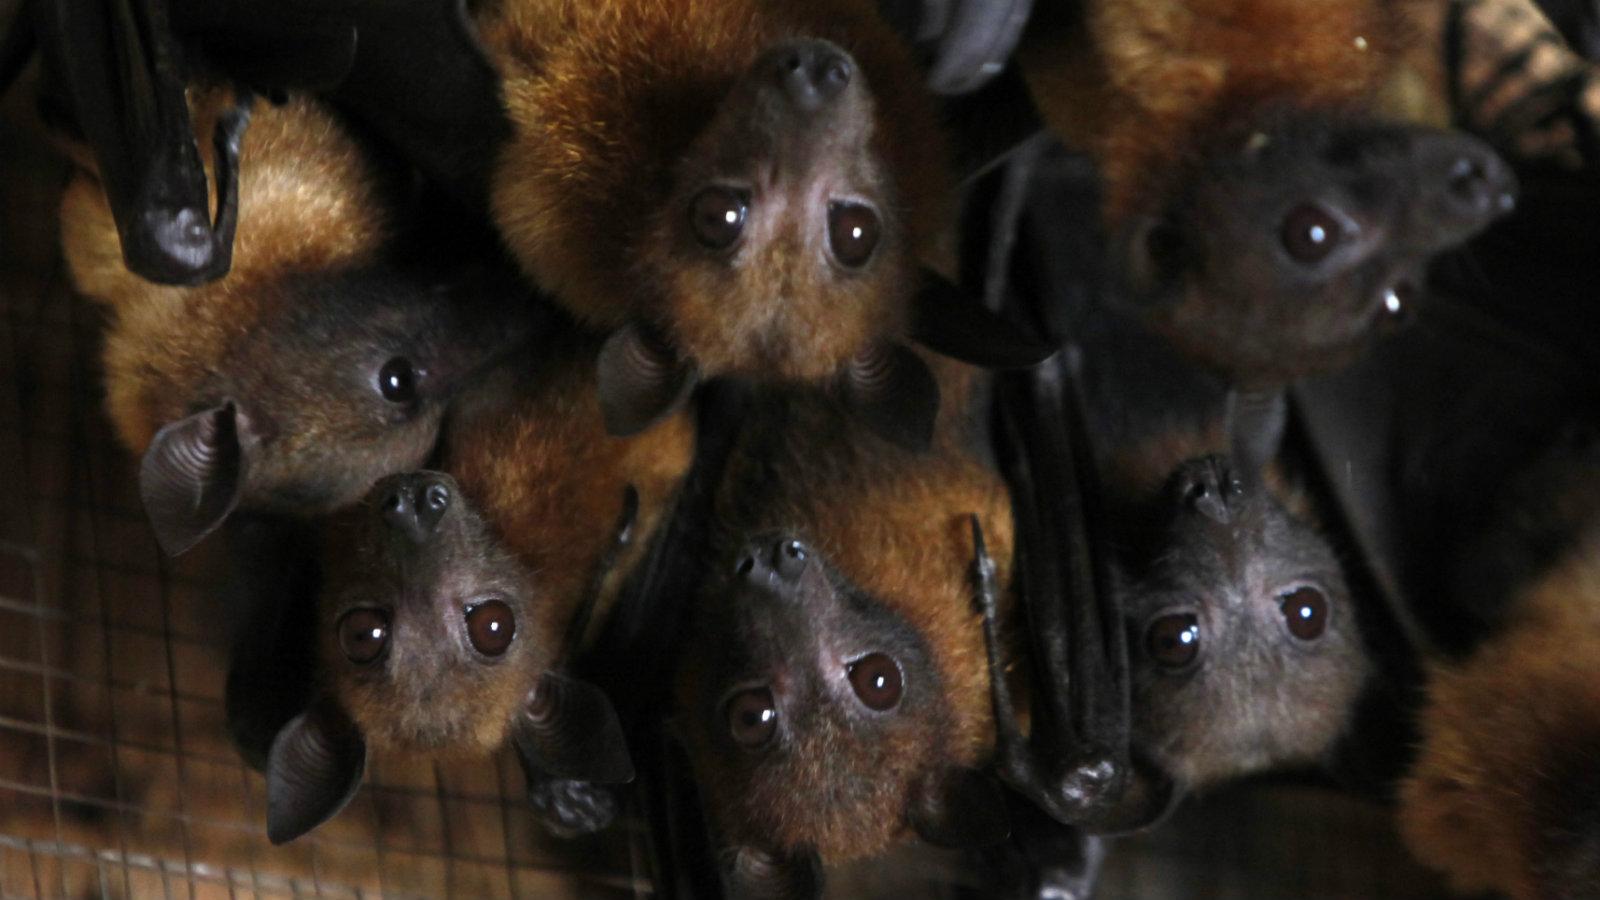 India-Nipah-virus-Kerala-Kozhikode-fruit-bat-WHO